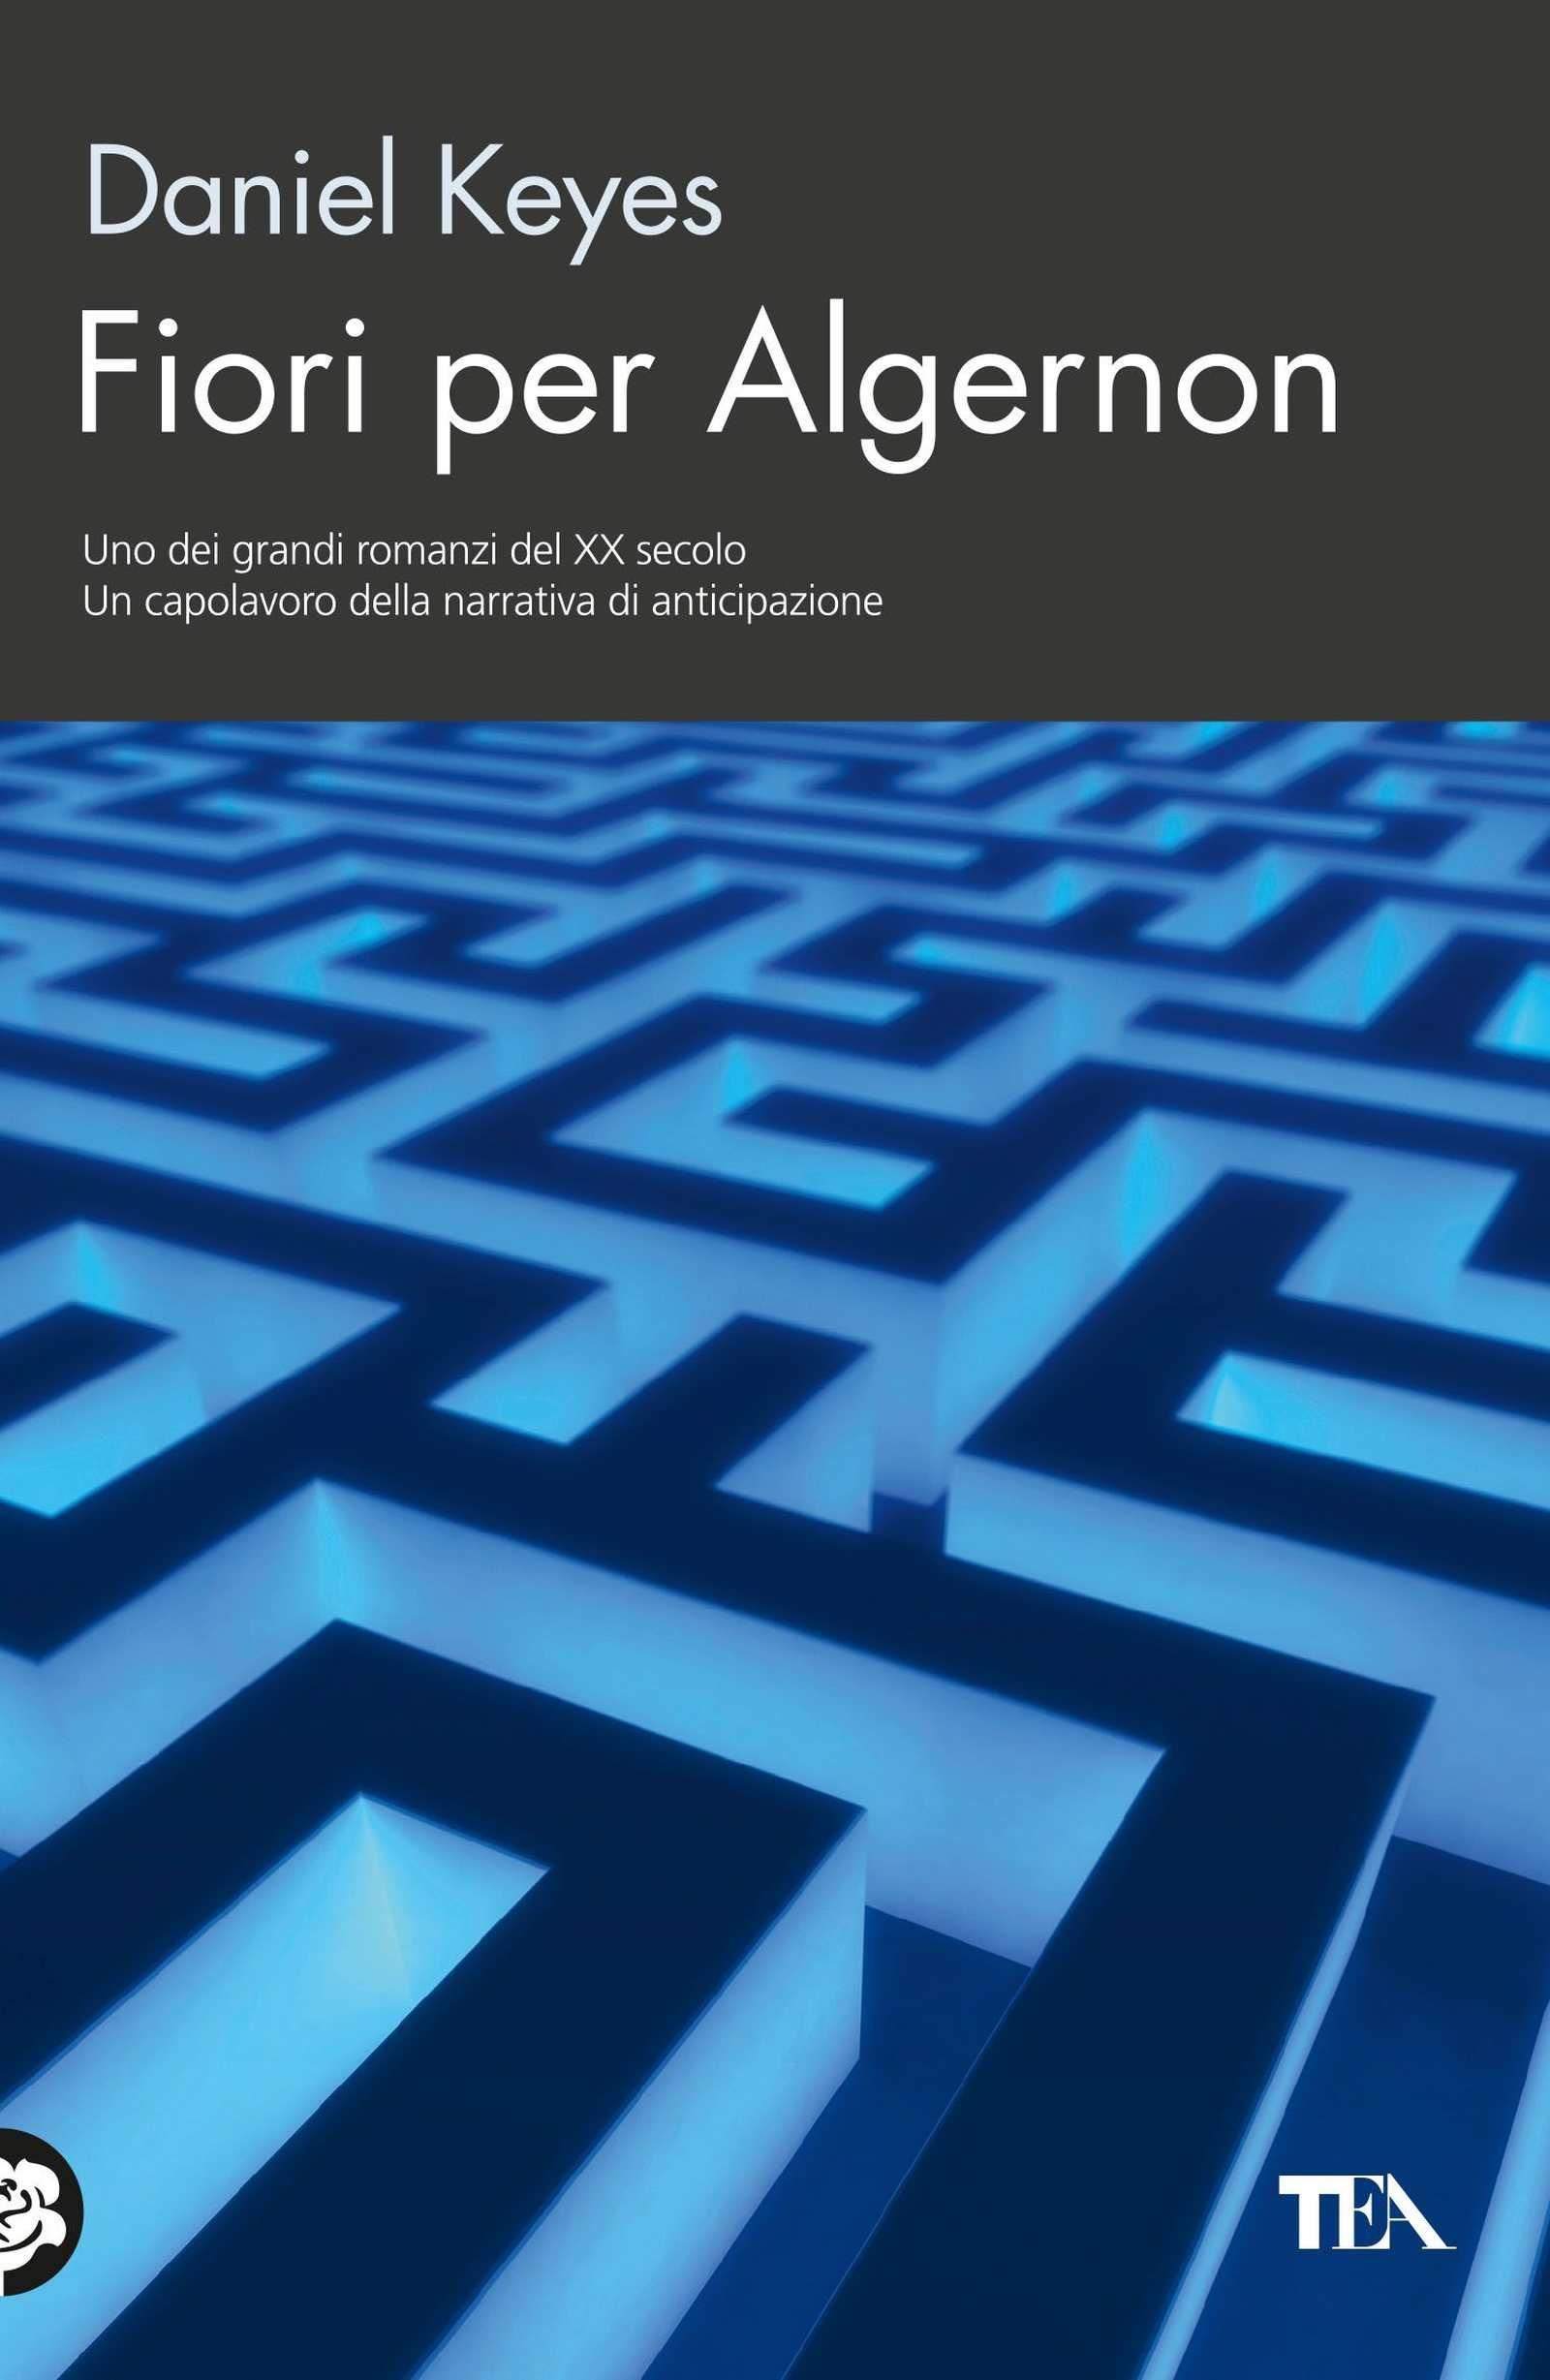 Amazon.it: Fiori per Algernon - Keyes, Daniel, Oddera, B. - Libri